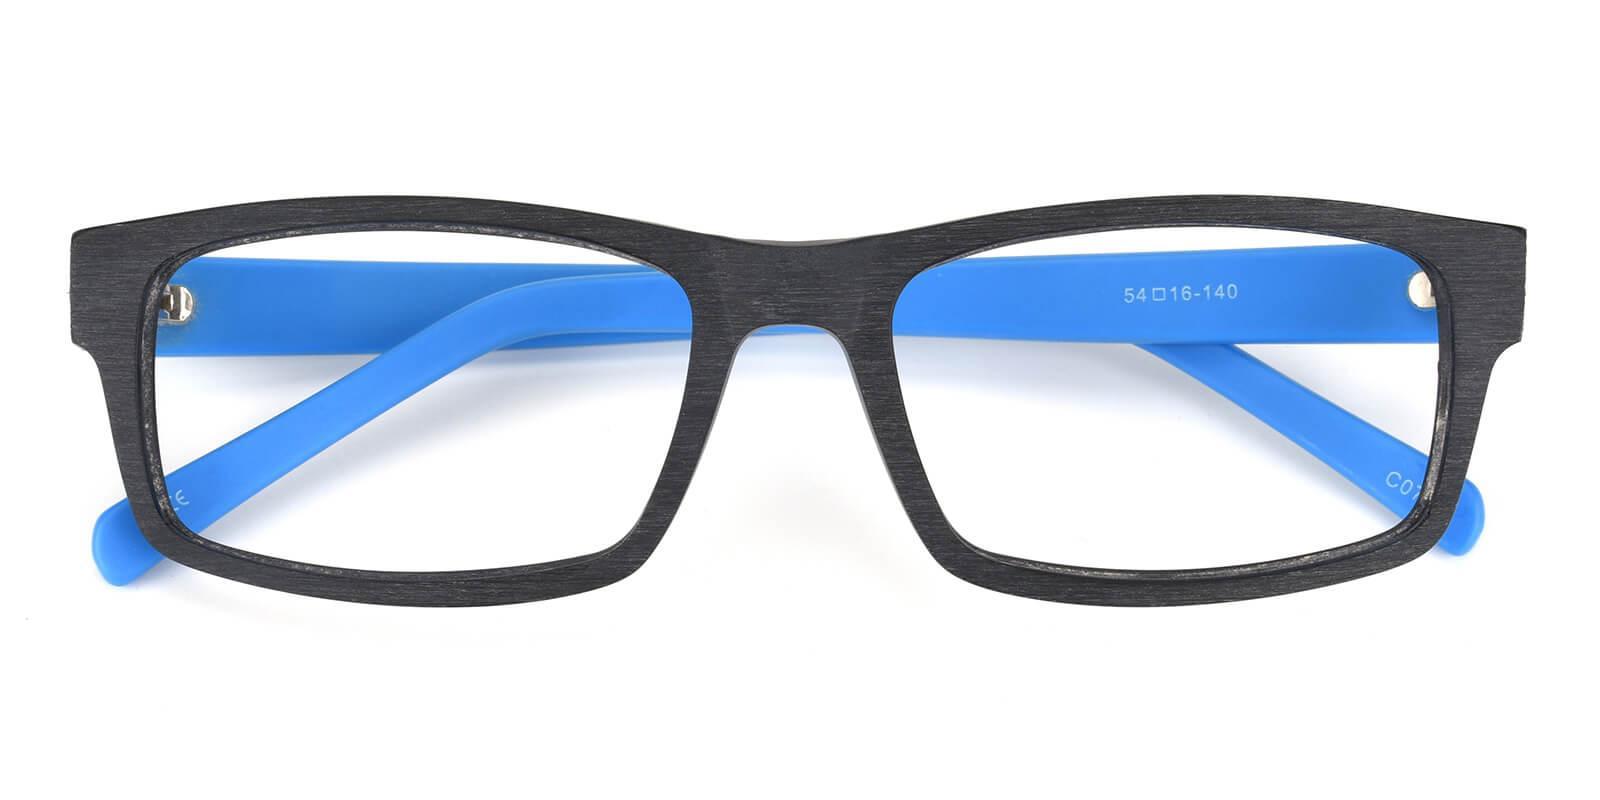 Nadien-Blue-Rectangle-Acetate-Eyeglasses-detail